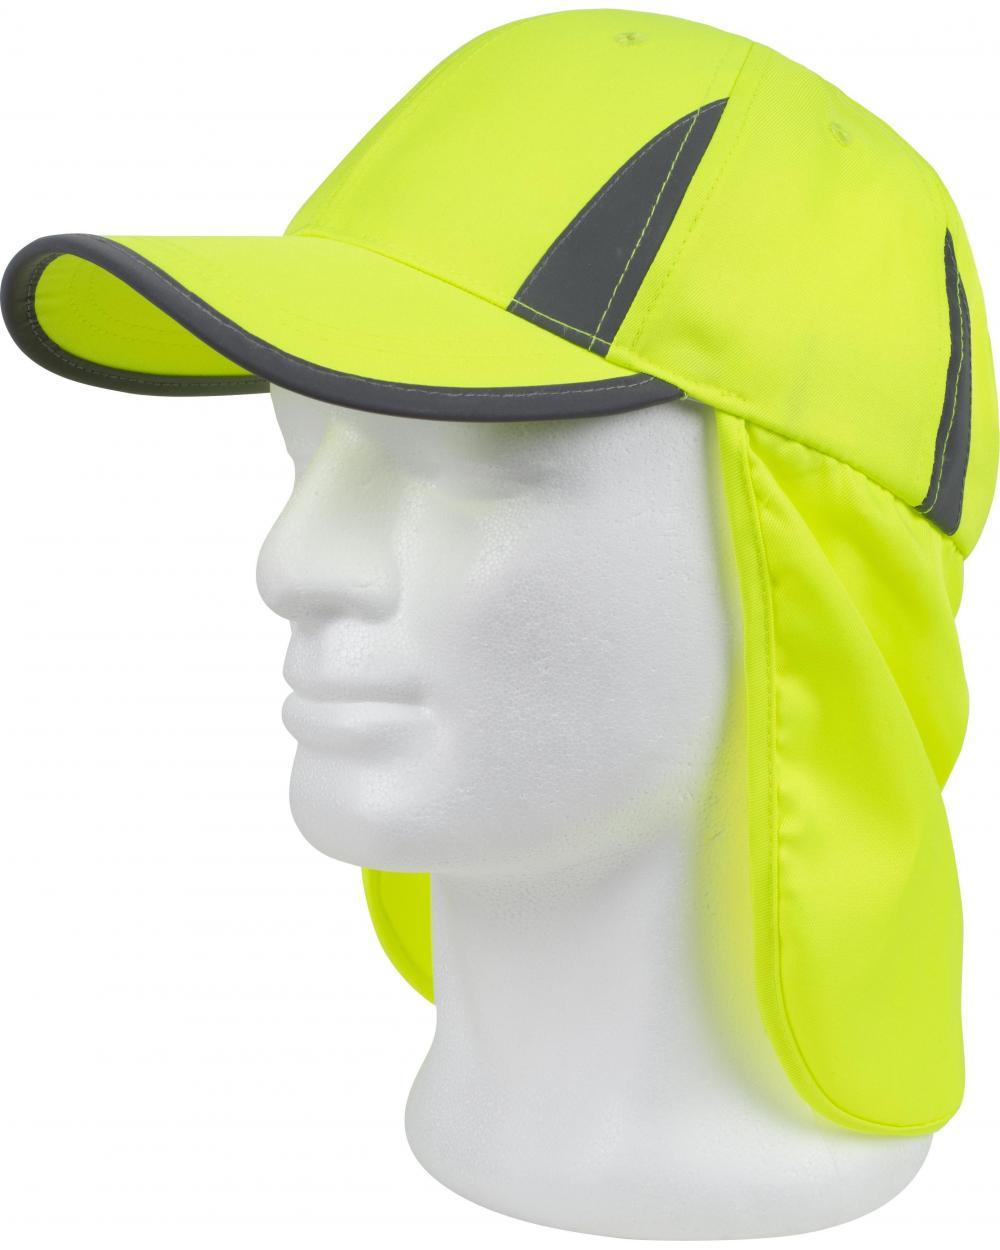 Comprar Gorra de alta visibilidad WFA904 Amarillo AV workteam barato